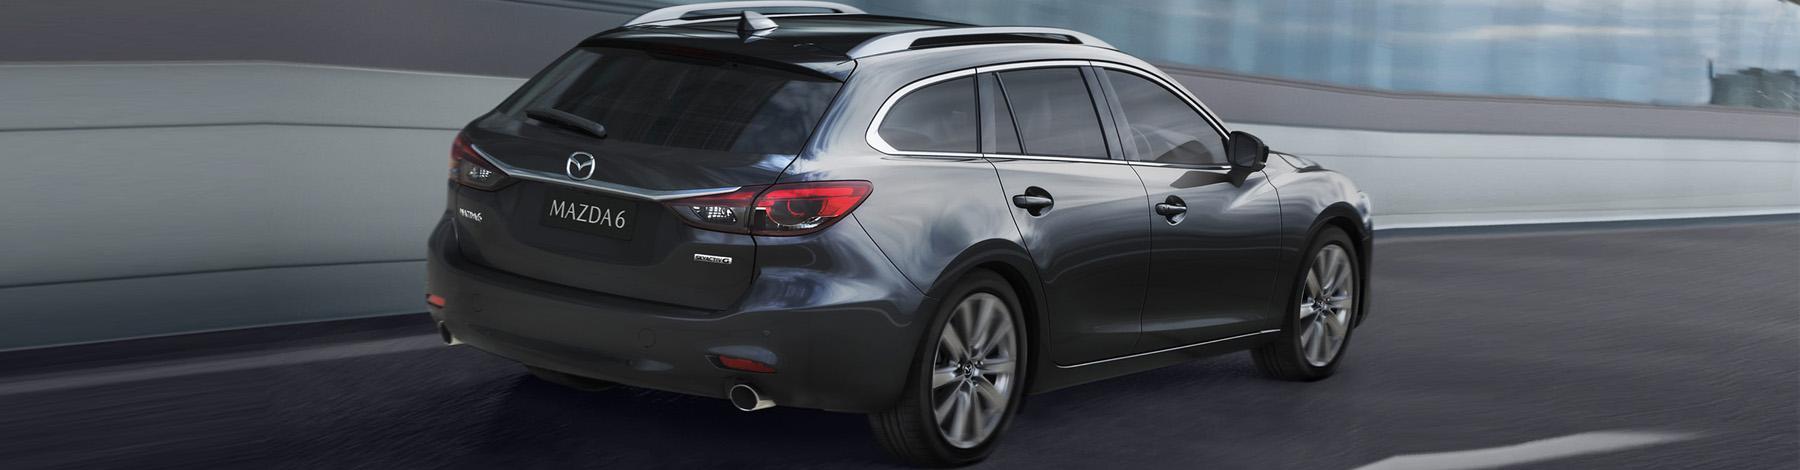 Macarthur Mazda Mazda6 Machine Grey Metallic